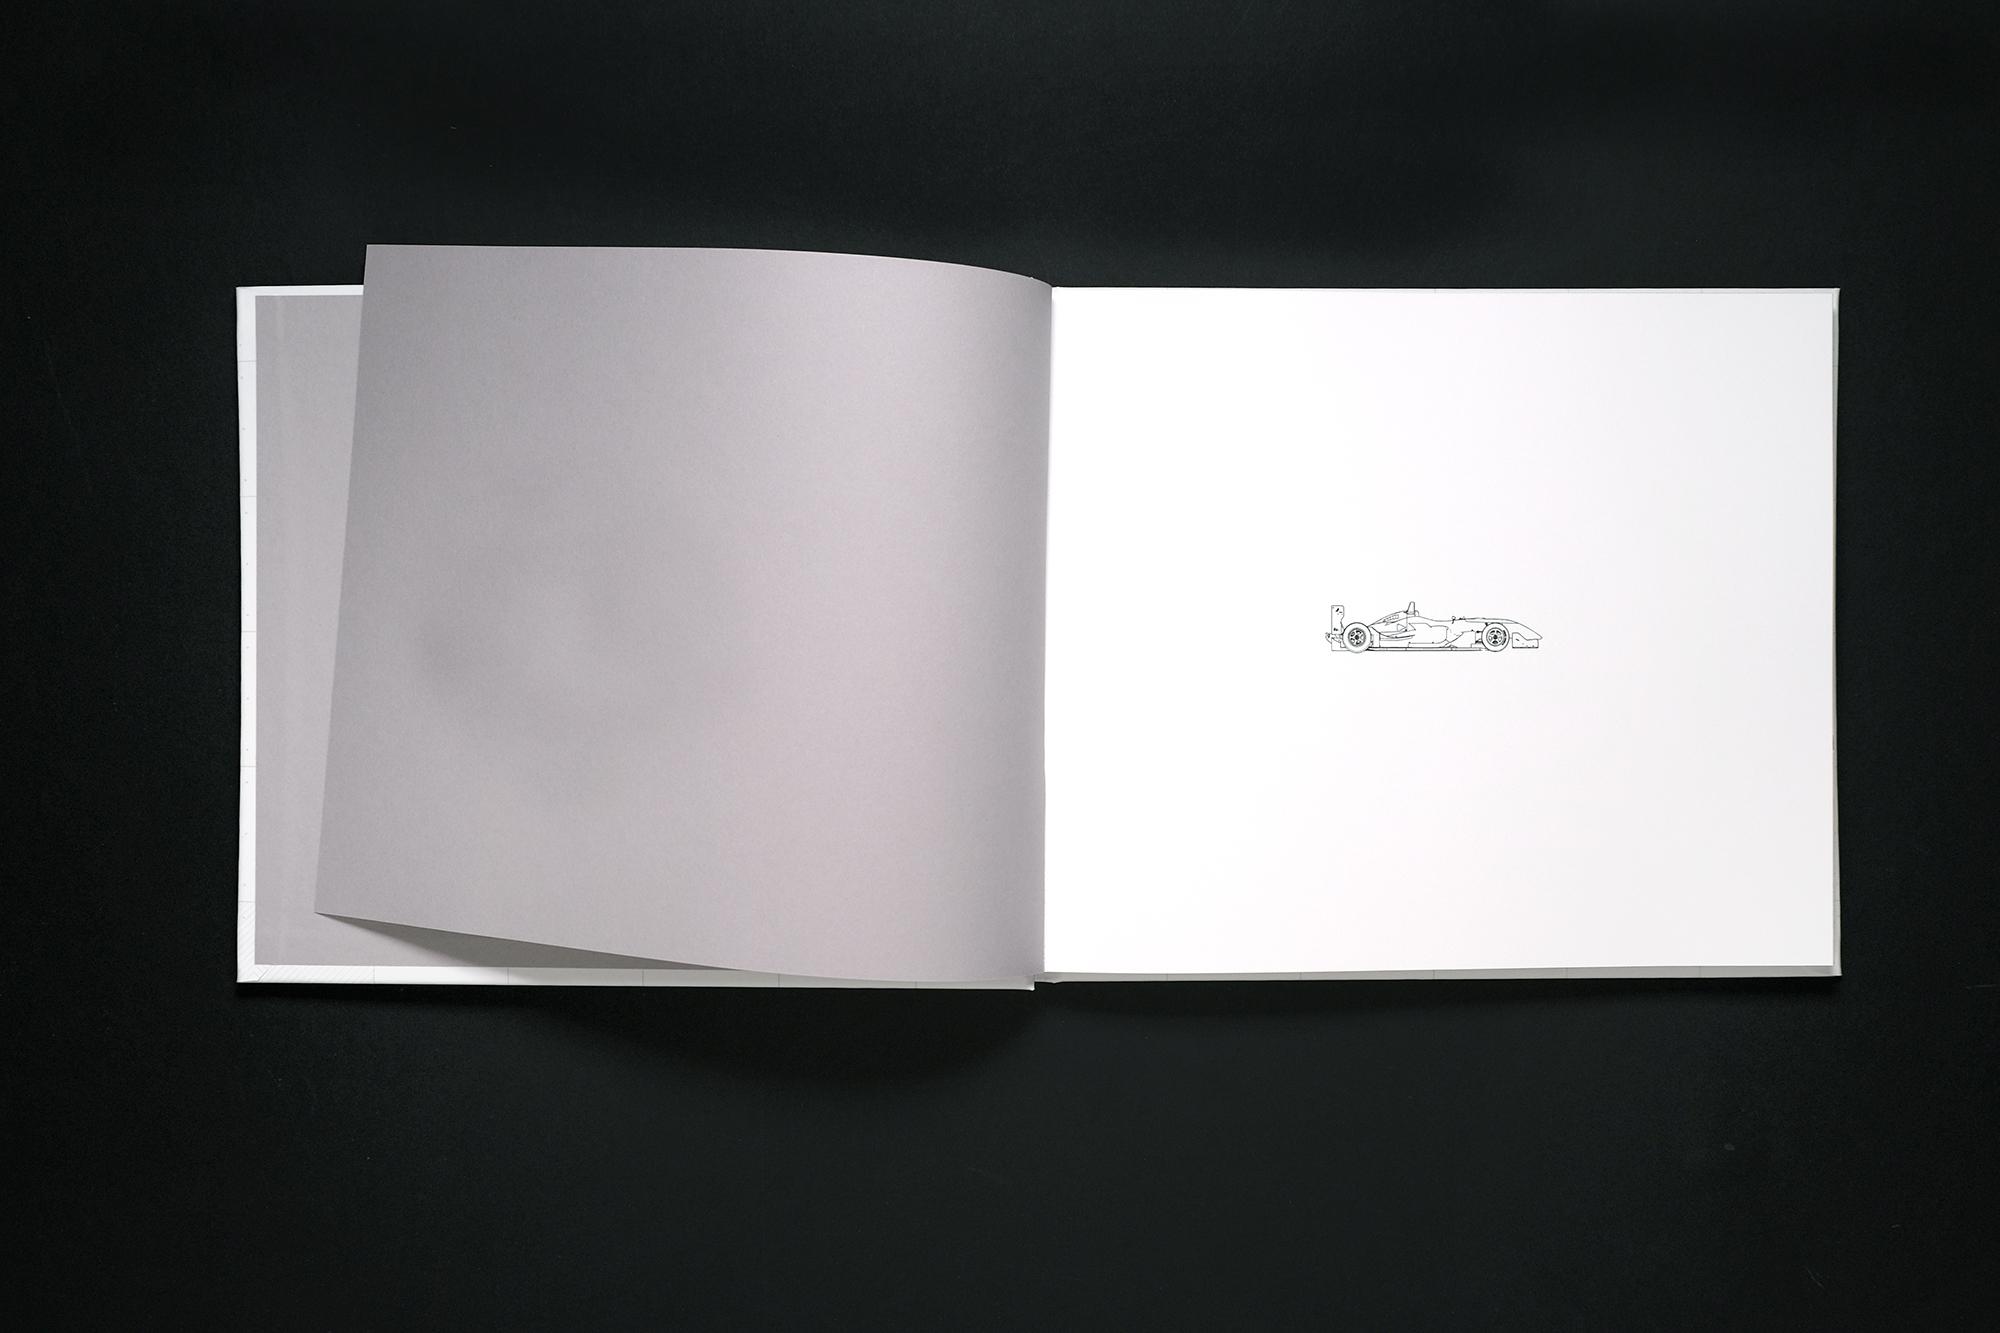 https://rusyndesign.co.uk/wp-content/uploads/2020/04/UWR-19-book-shots-02.jpg